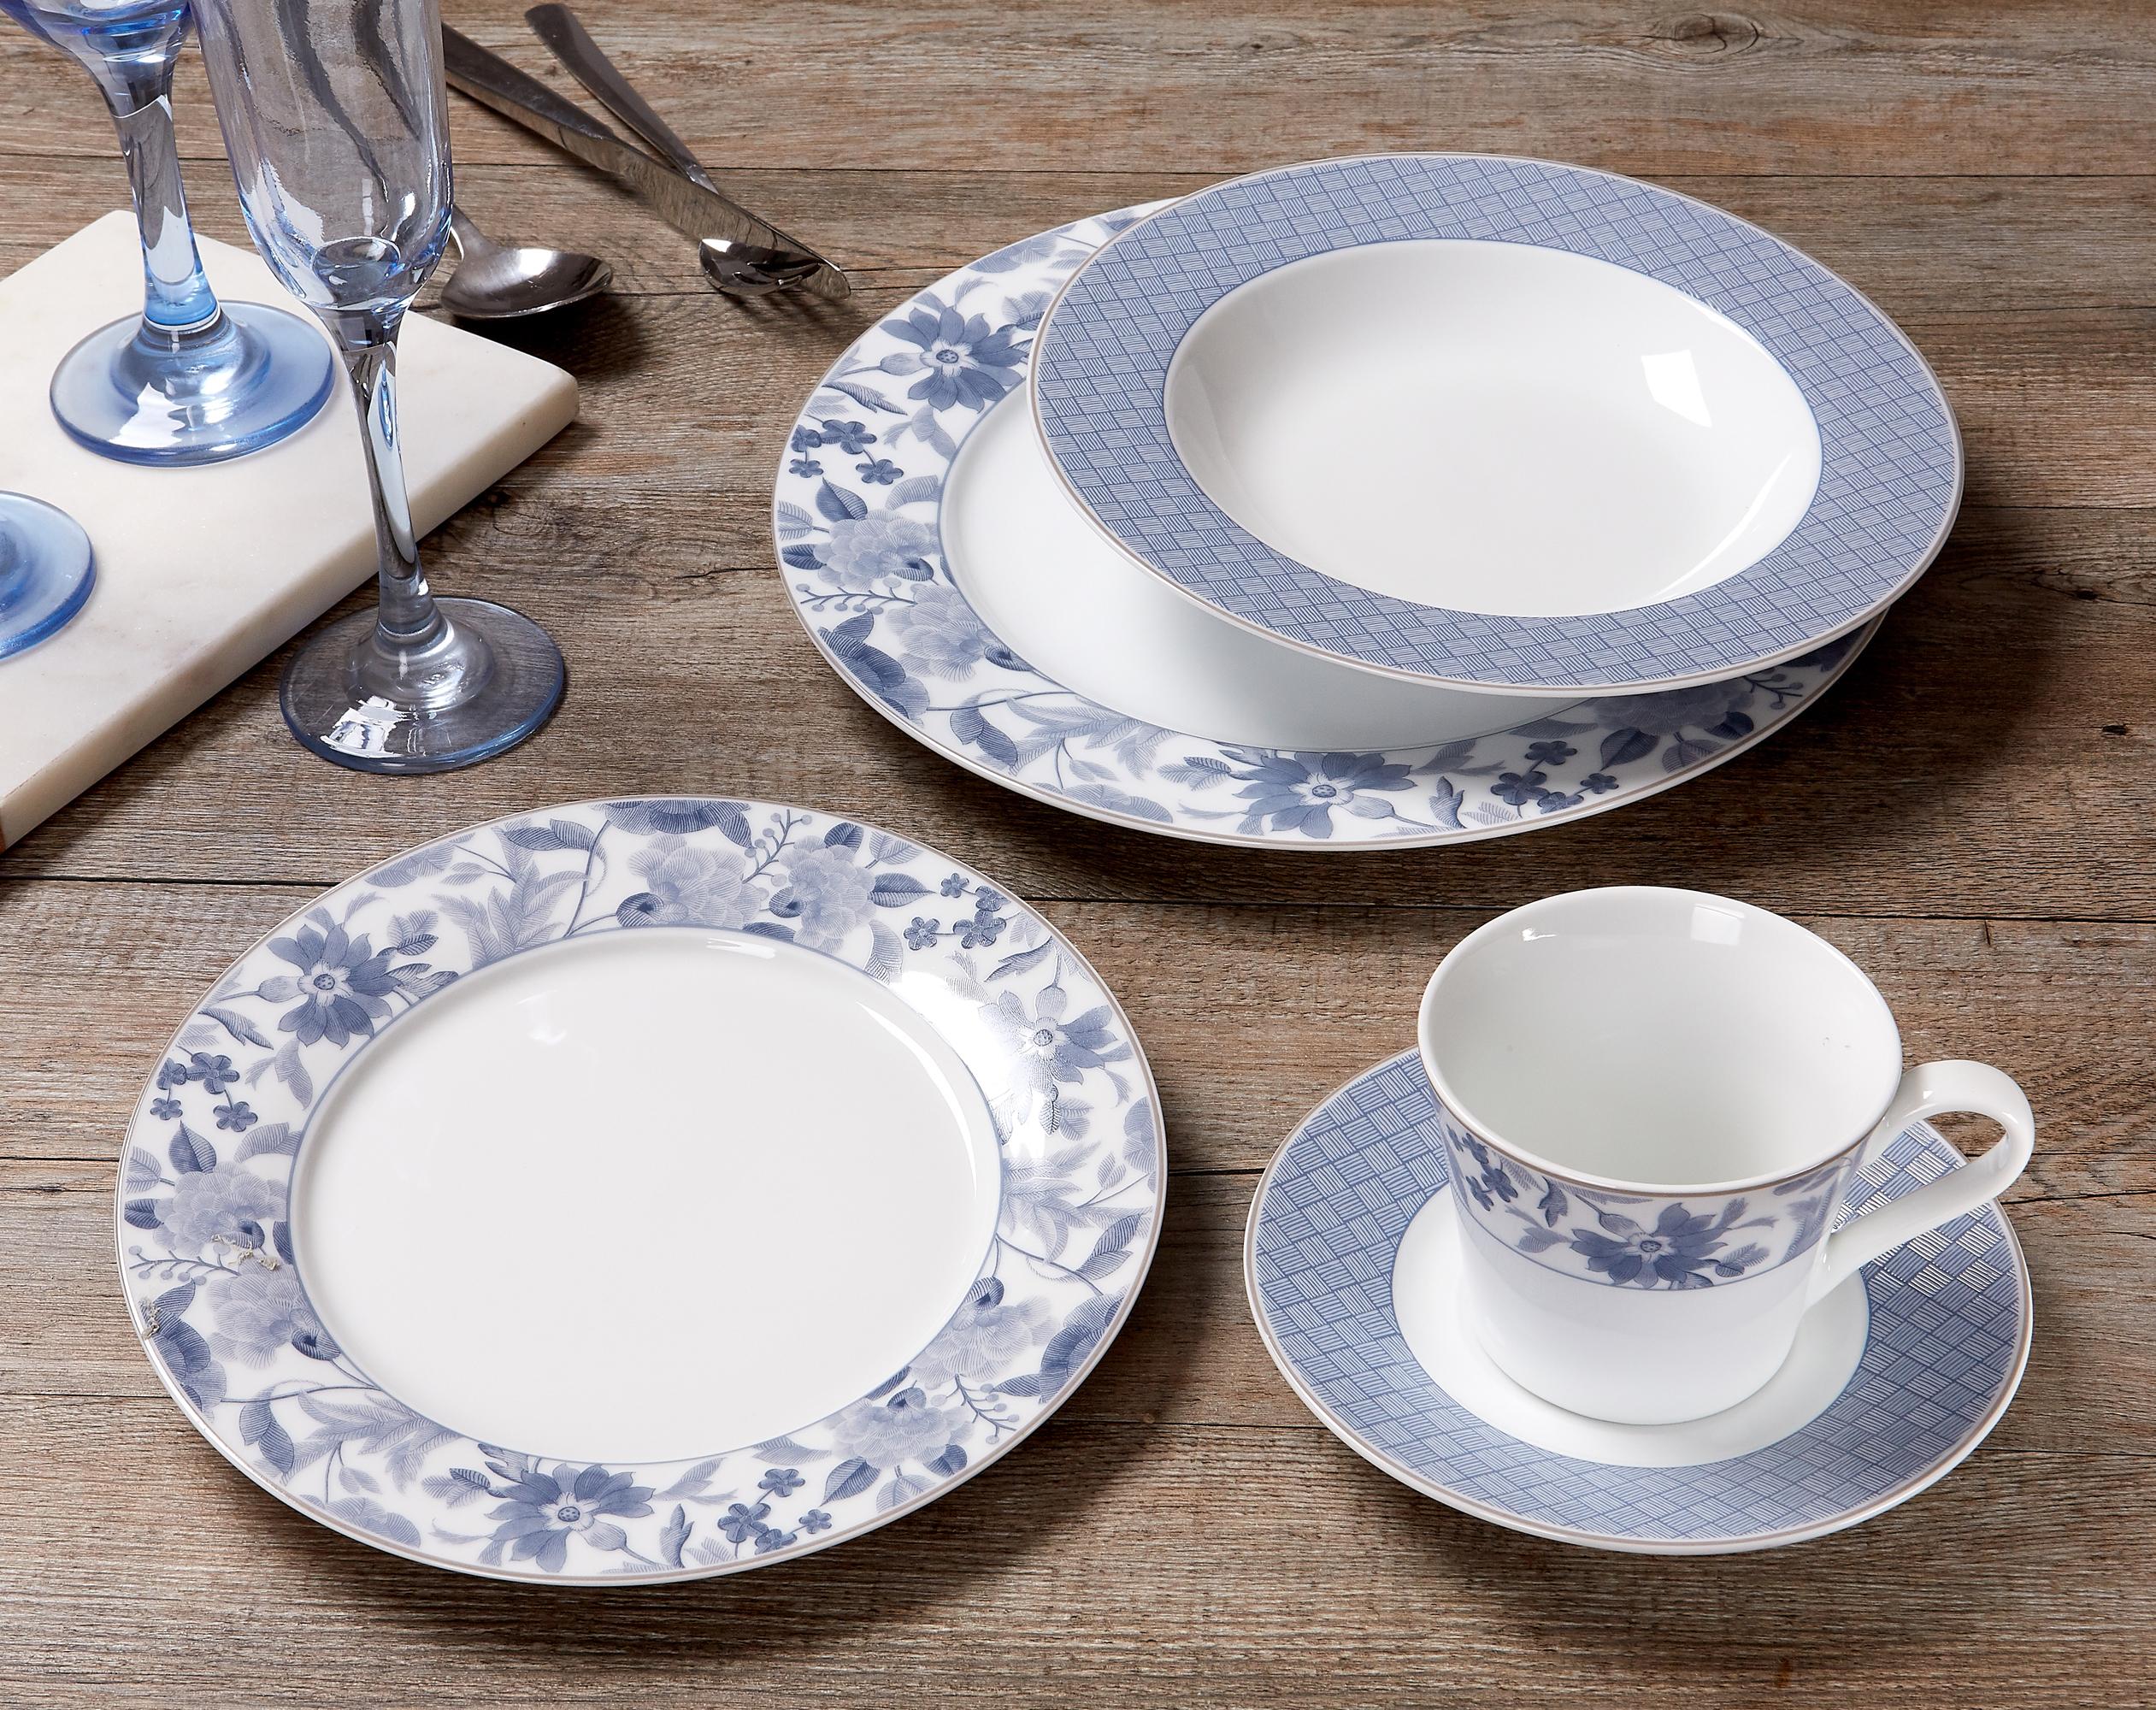 Ritzenhoff Breker Tafelservice Madras 12 Tlg Porzellan Geschirr Sets Ebay